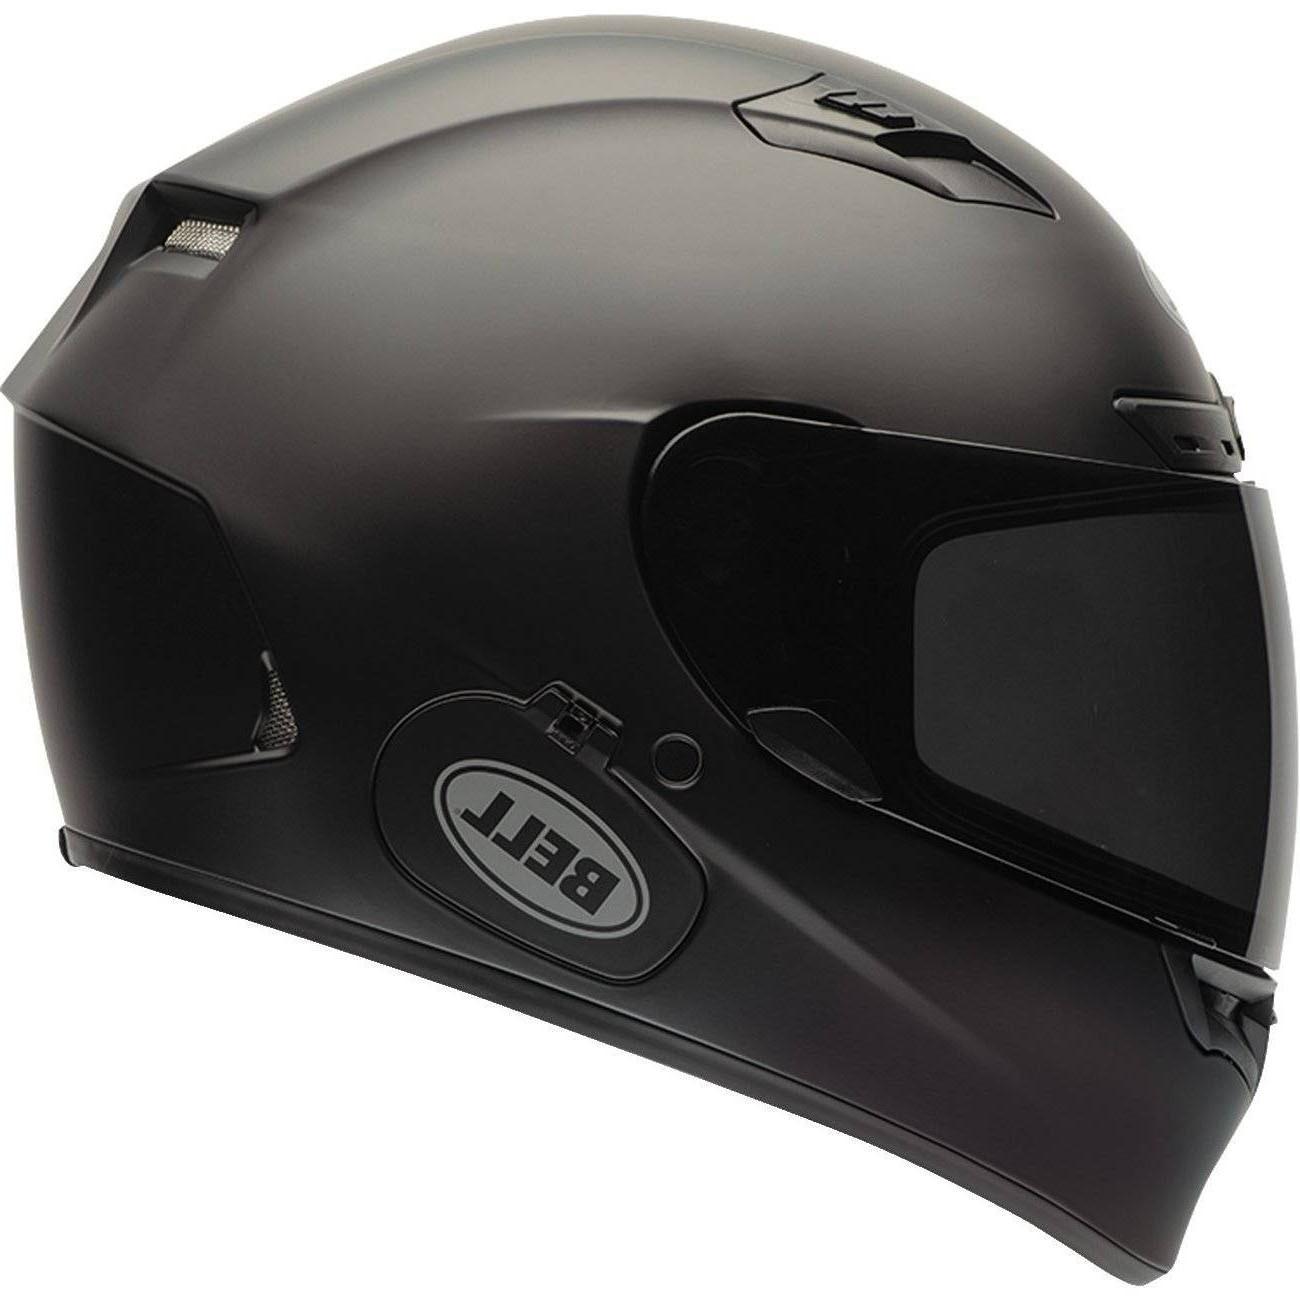 e472b0fe Bell Qualifier DLX MIPS Helmet Review